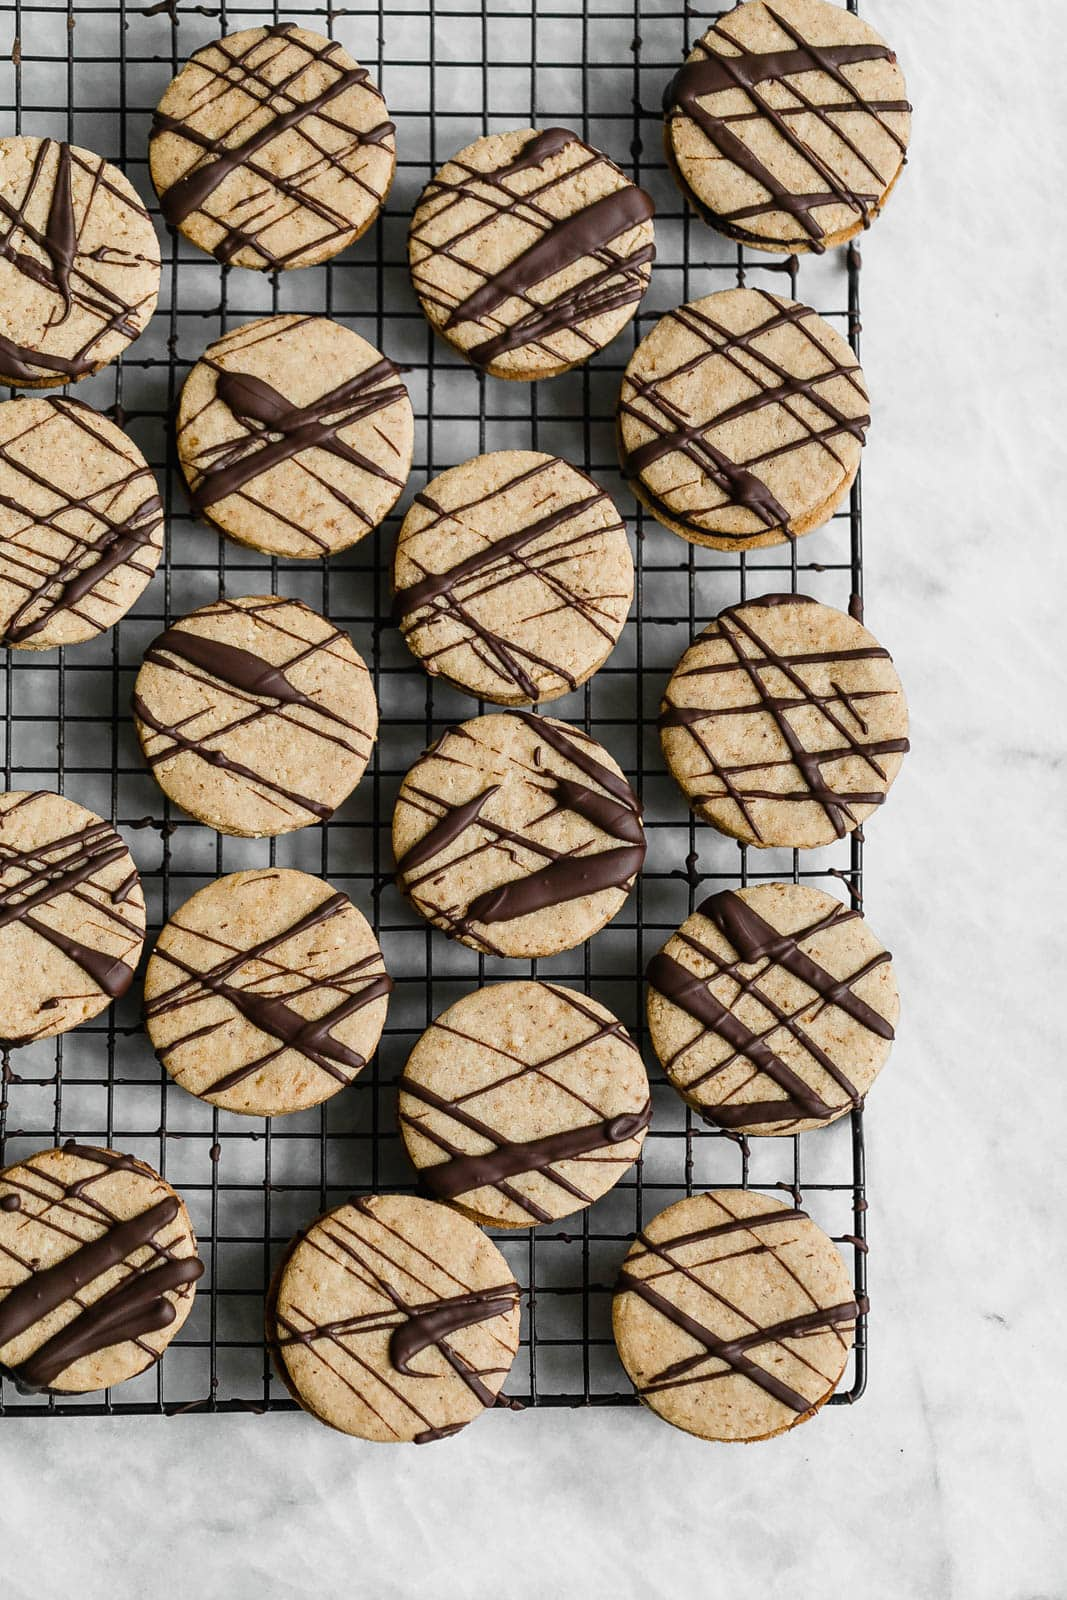 Hazelnut Espresso Sandwich Cookies on wire rack